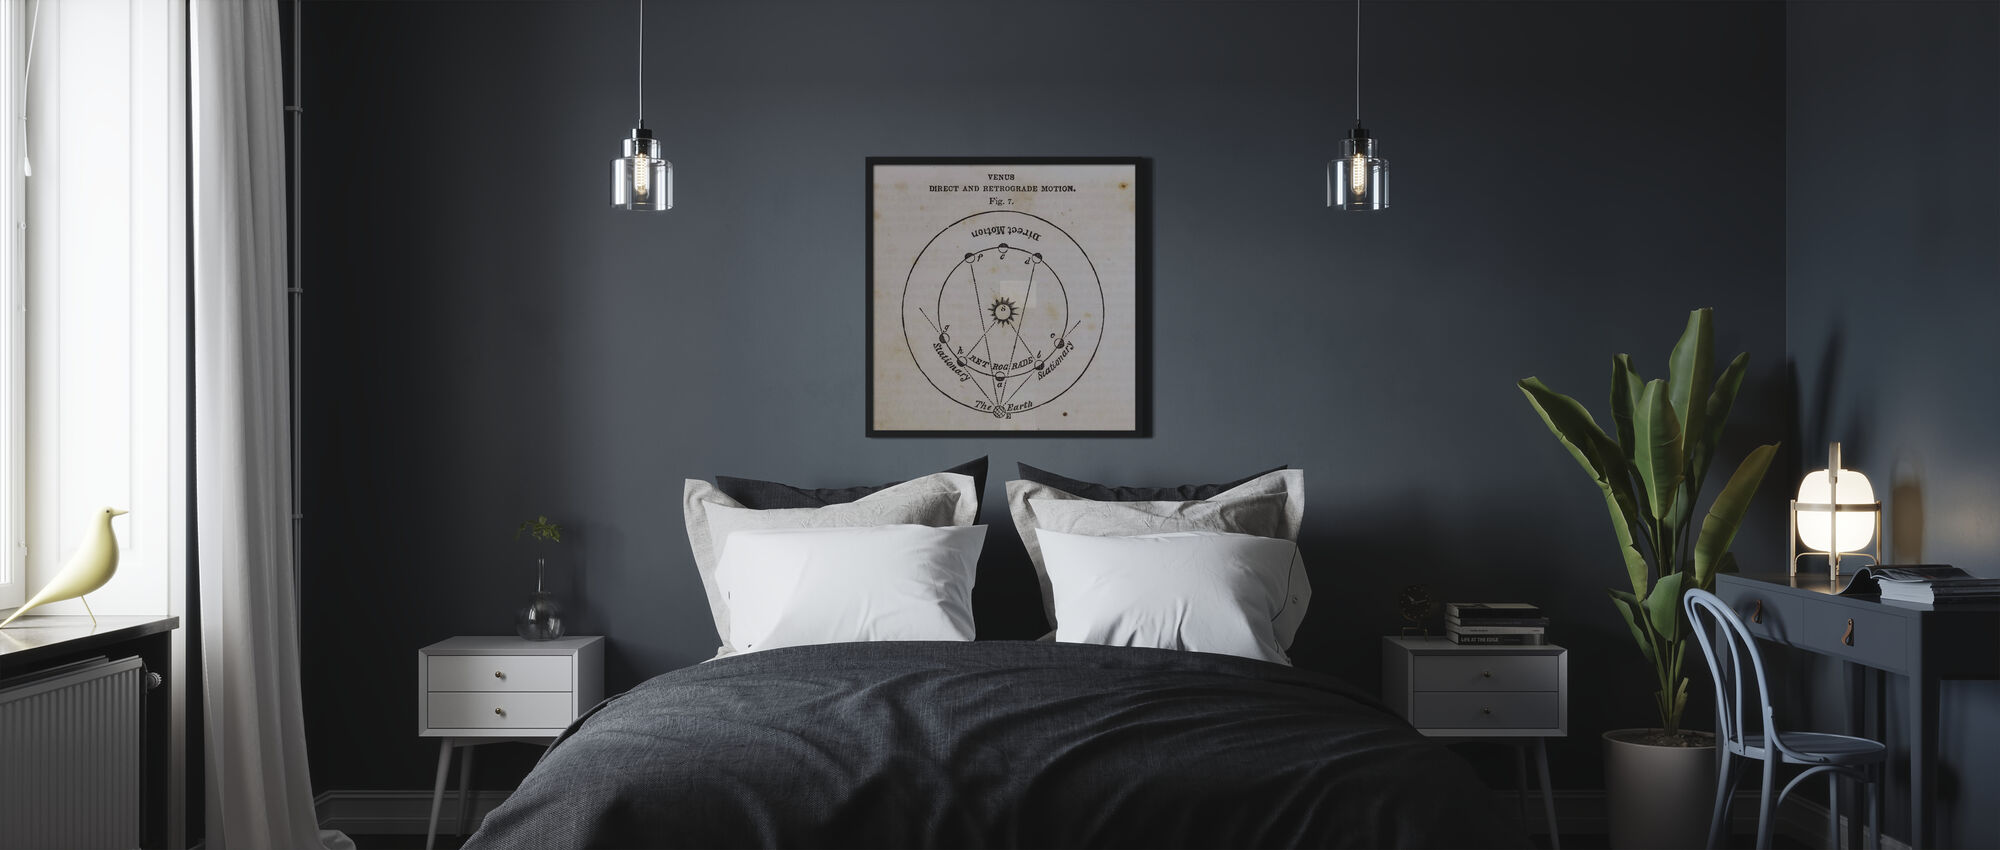 Geographie des Himmels IX - Gerahmtes bild - Schlafzimmer